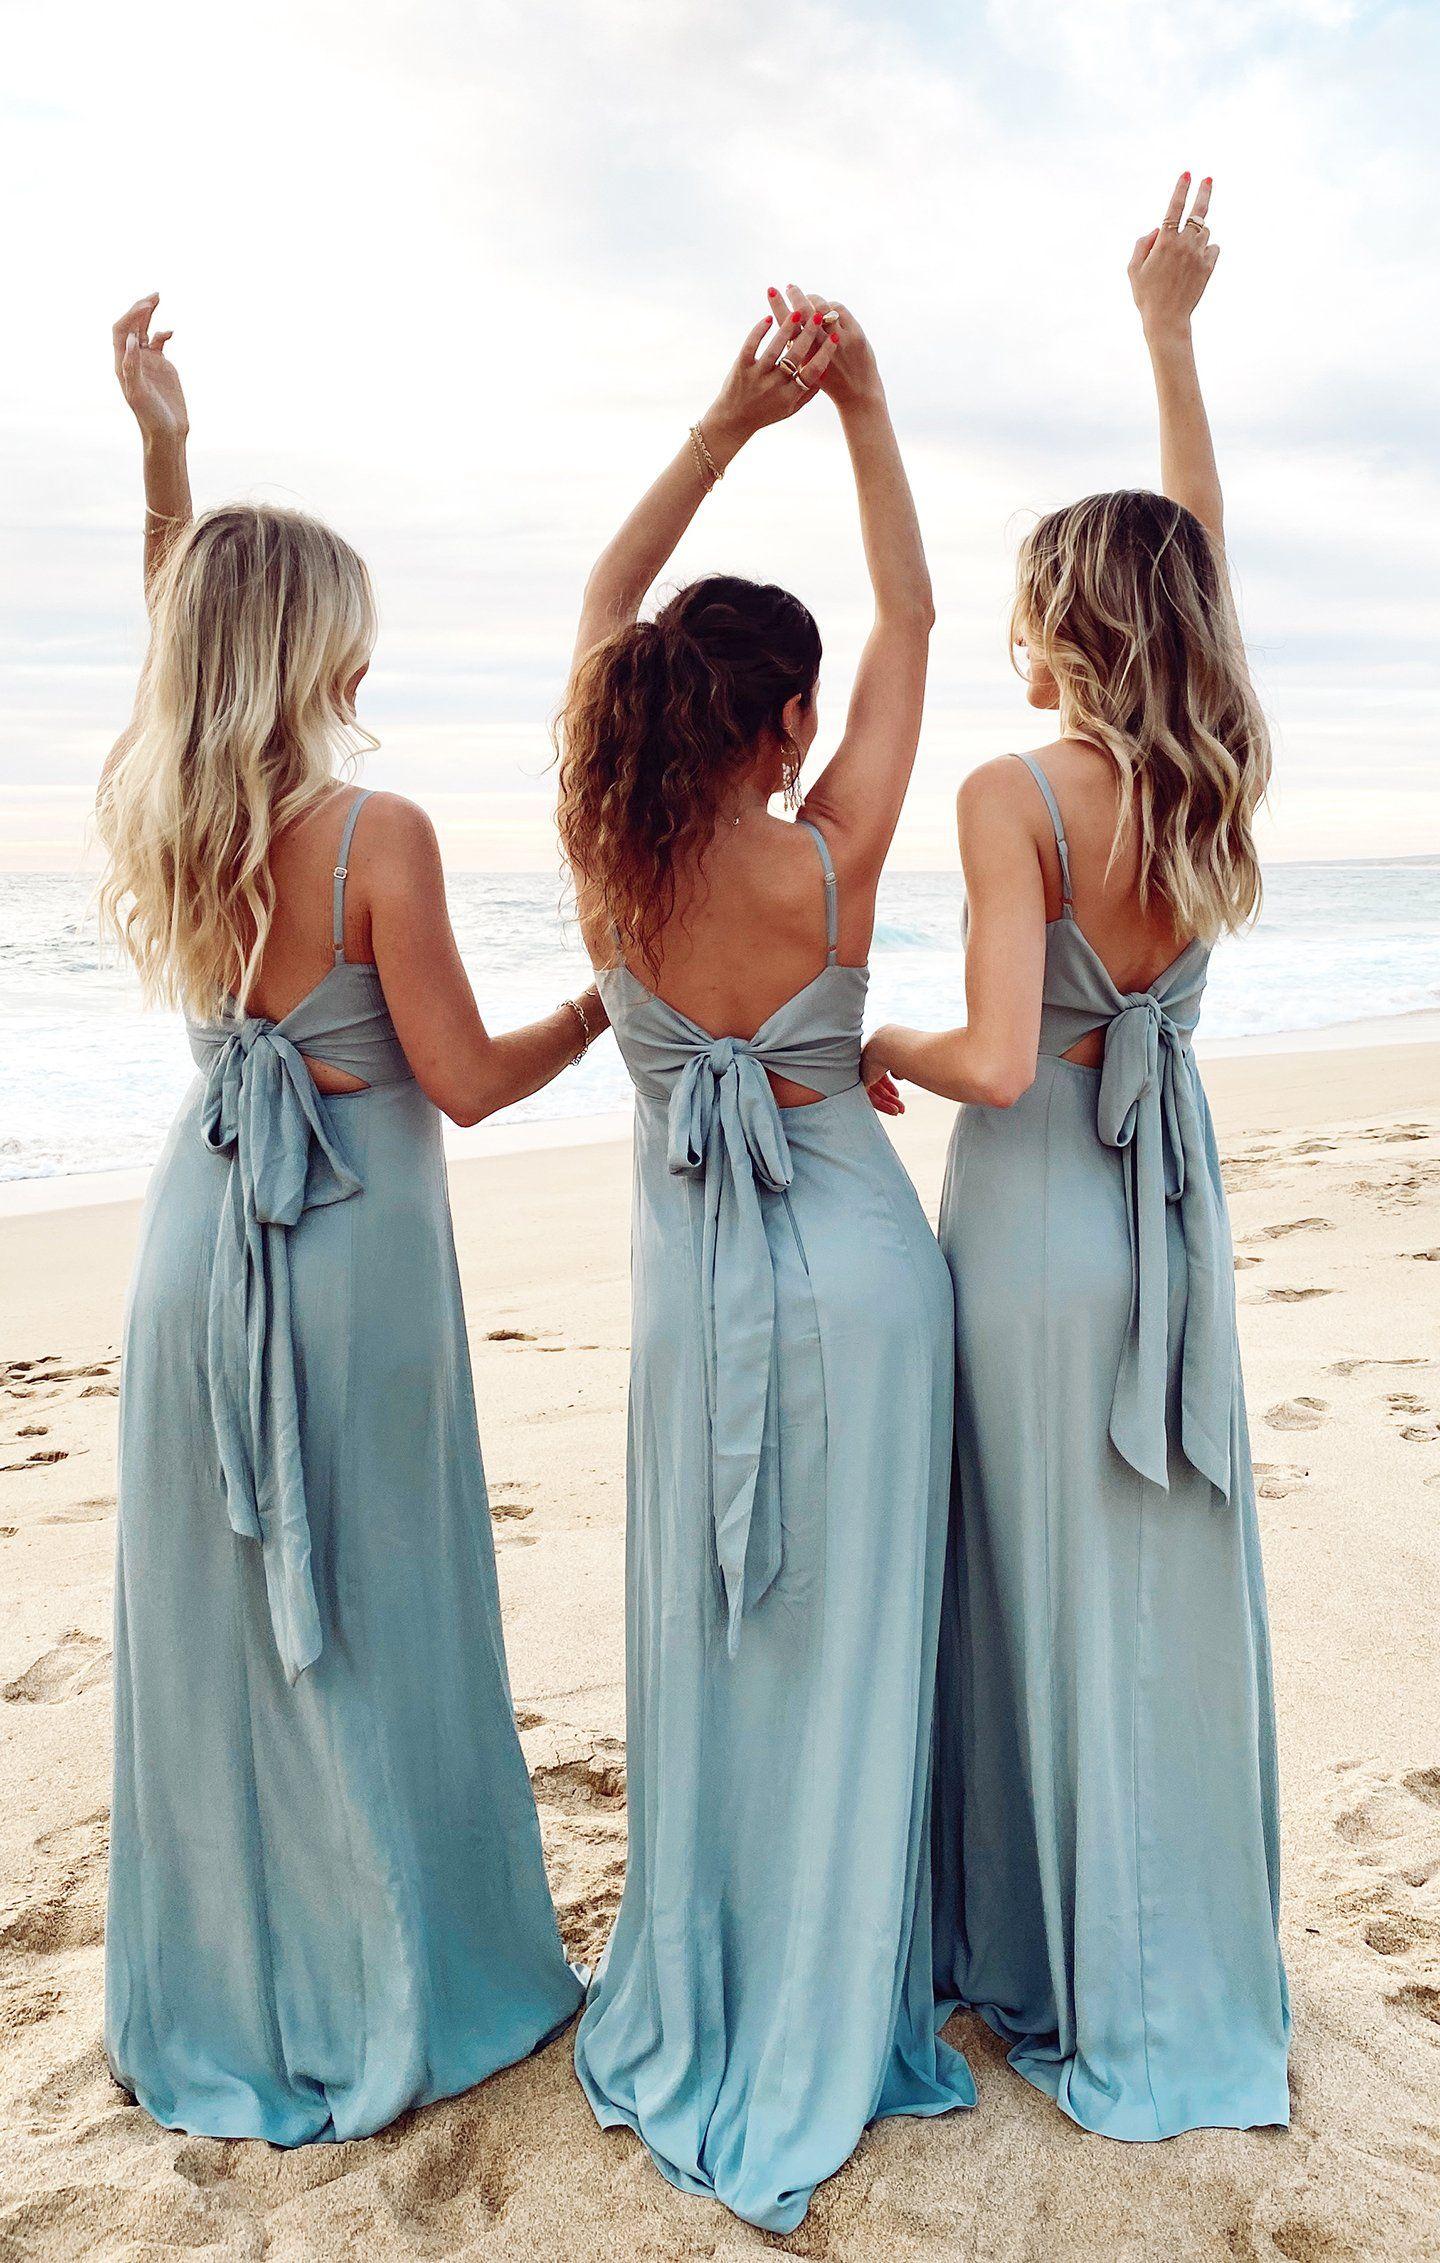 Lauren Tie Maxi Dress Neutral Mauve Chiffon In 2020 Beach Bridesmaid Dresses Blue Bridesmaid Dresses Mumu Bridesmaid Dresses,Online Shopping Wedding Dresses In Karachi With Price